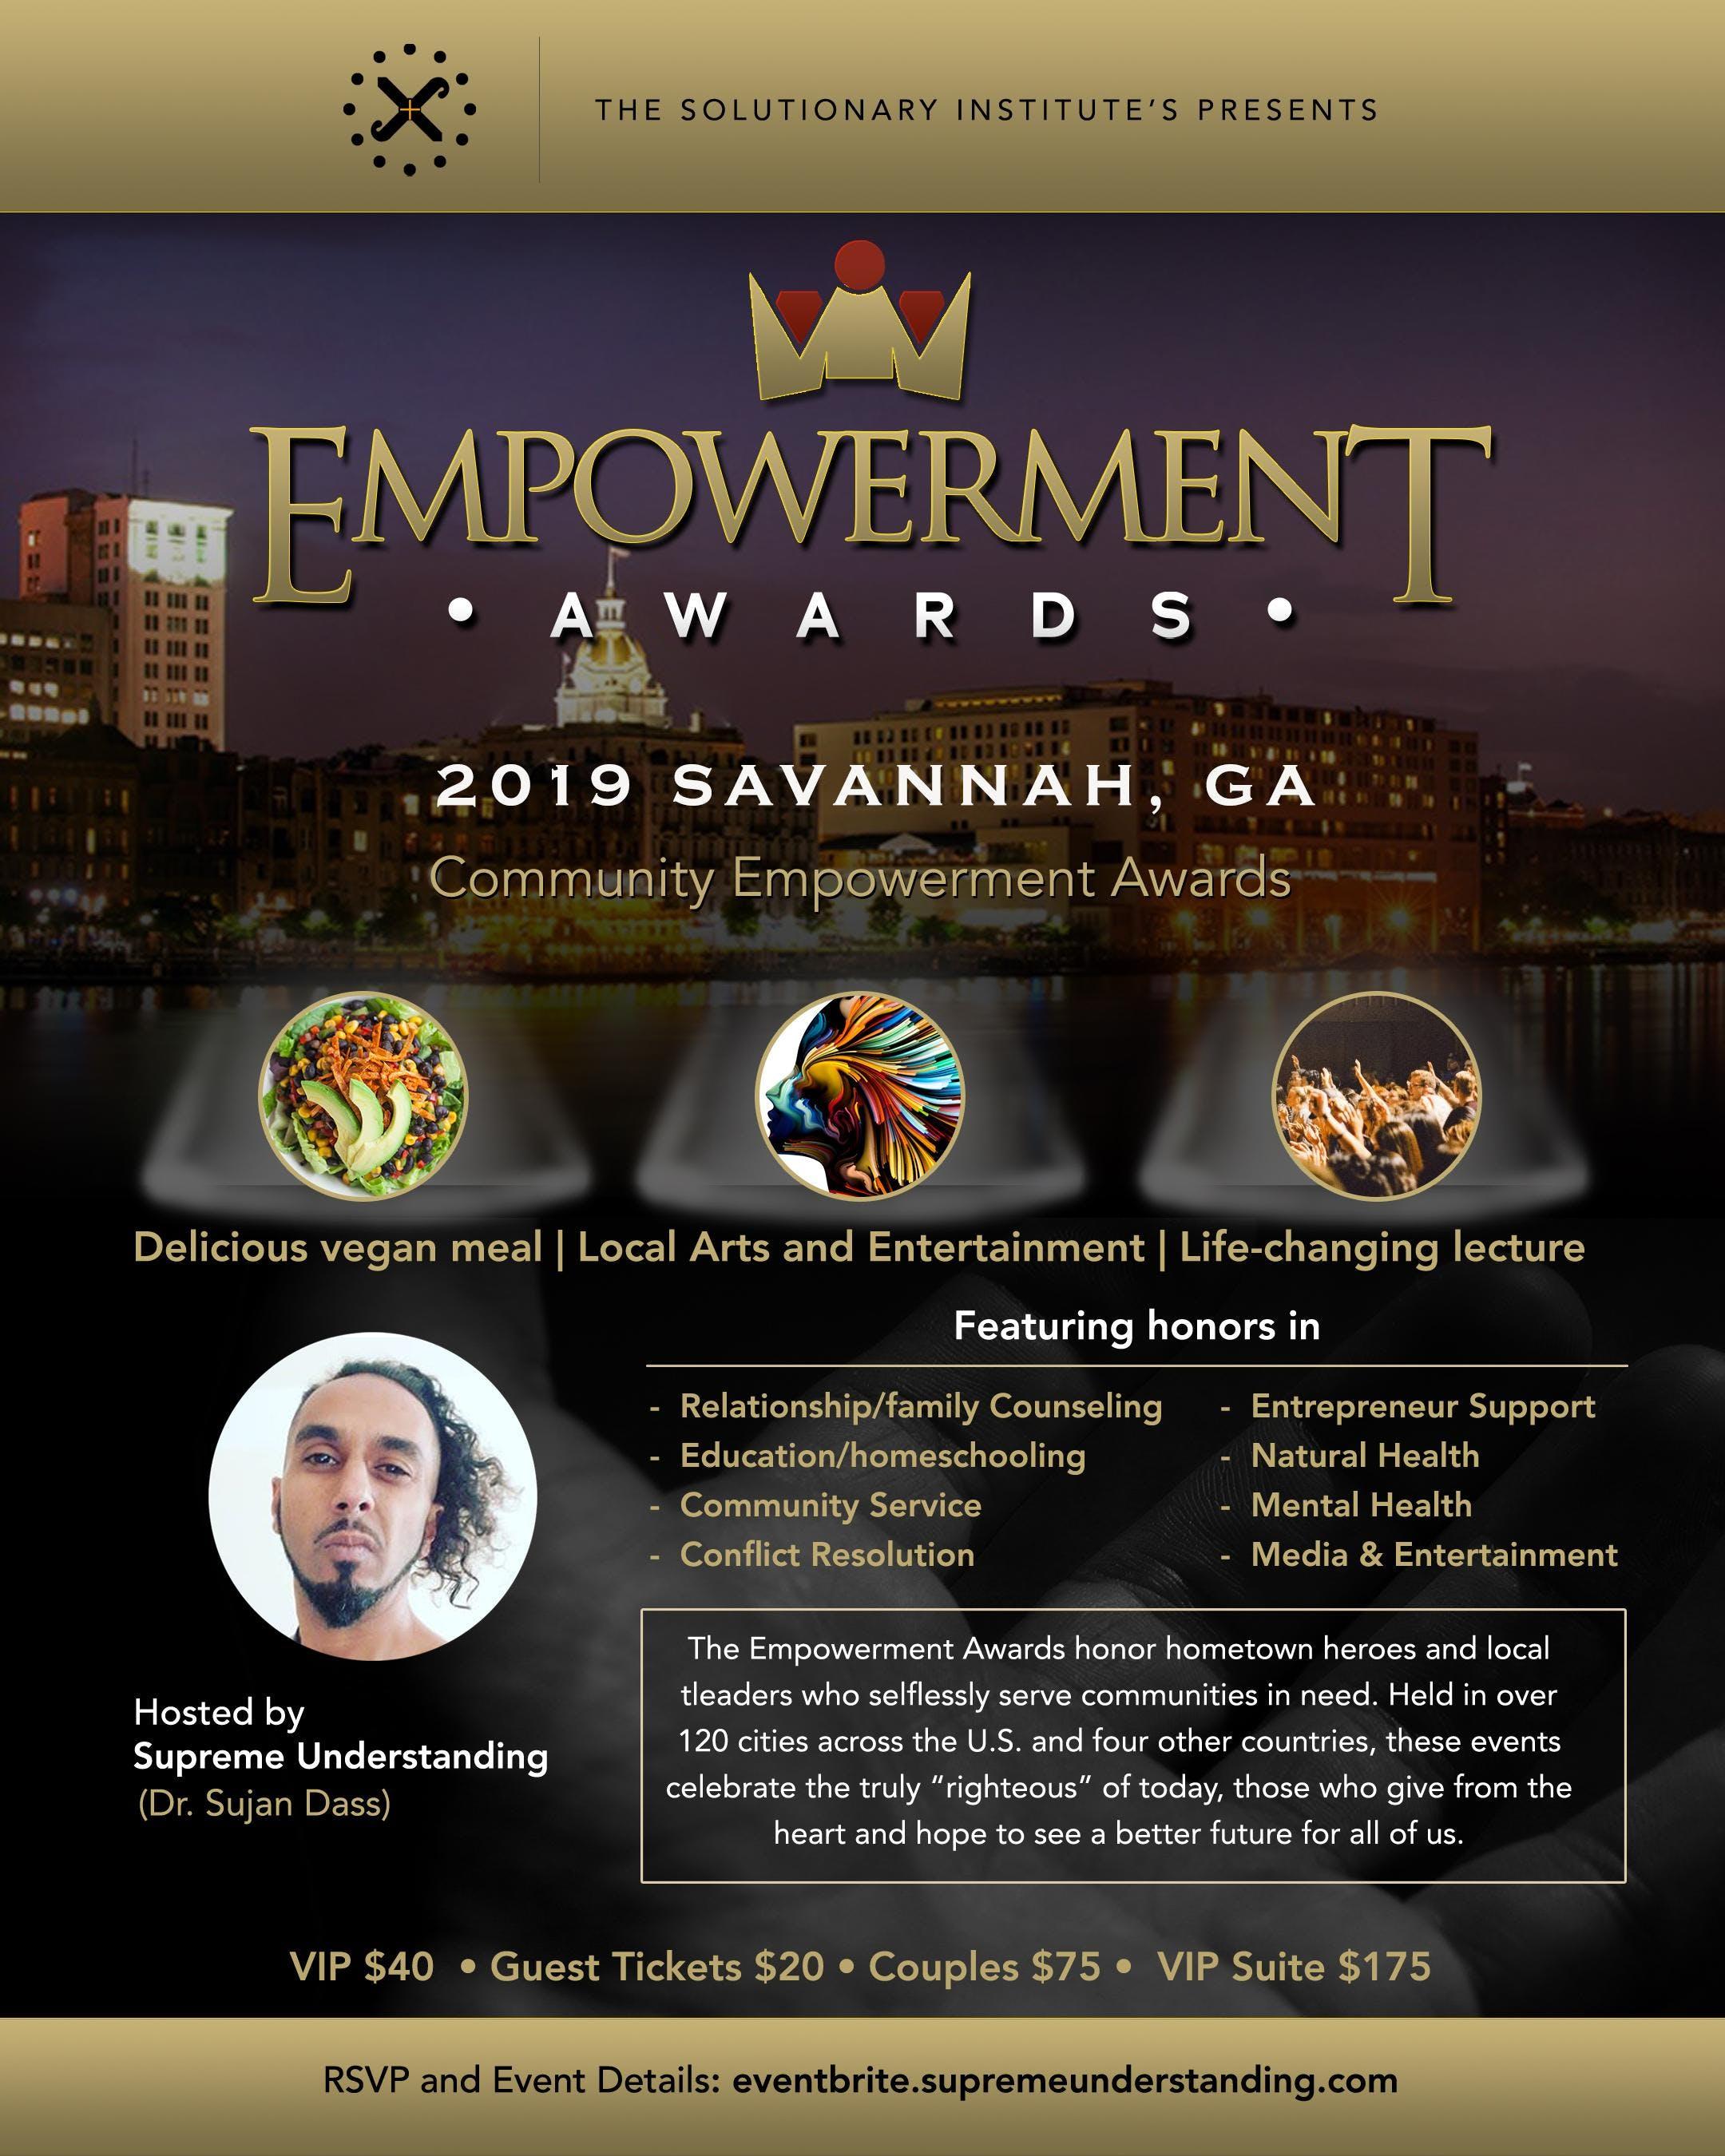 2019 Savannah Community Empowerment Awards